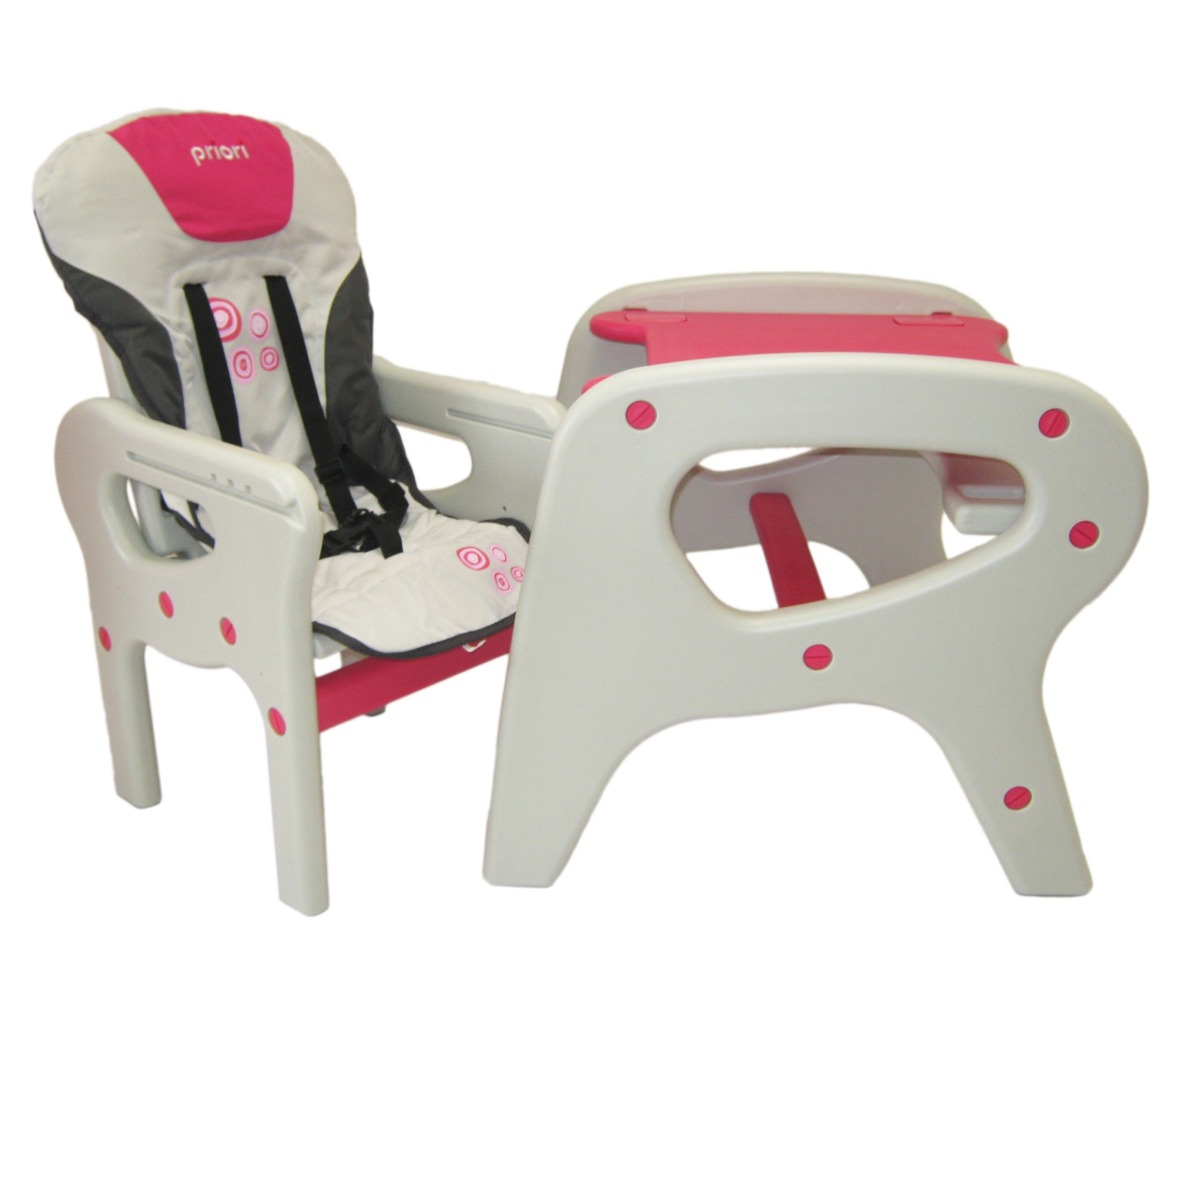 Silla comedor alta escritorio 2 en 1 para beb marca priori en mercado libre - Silla de mesa para bebe ...